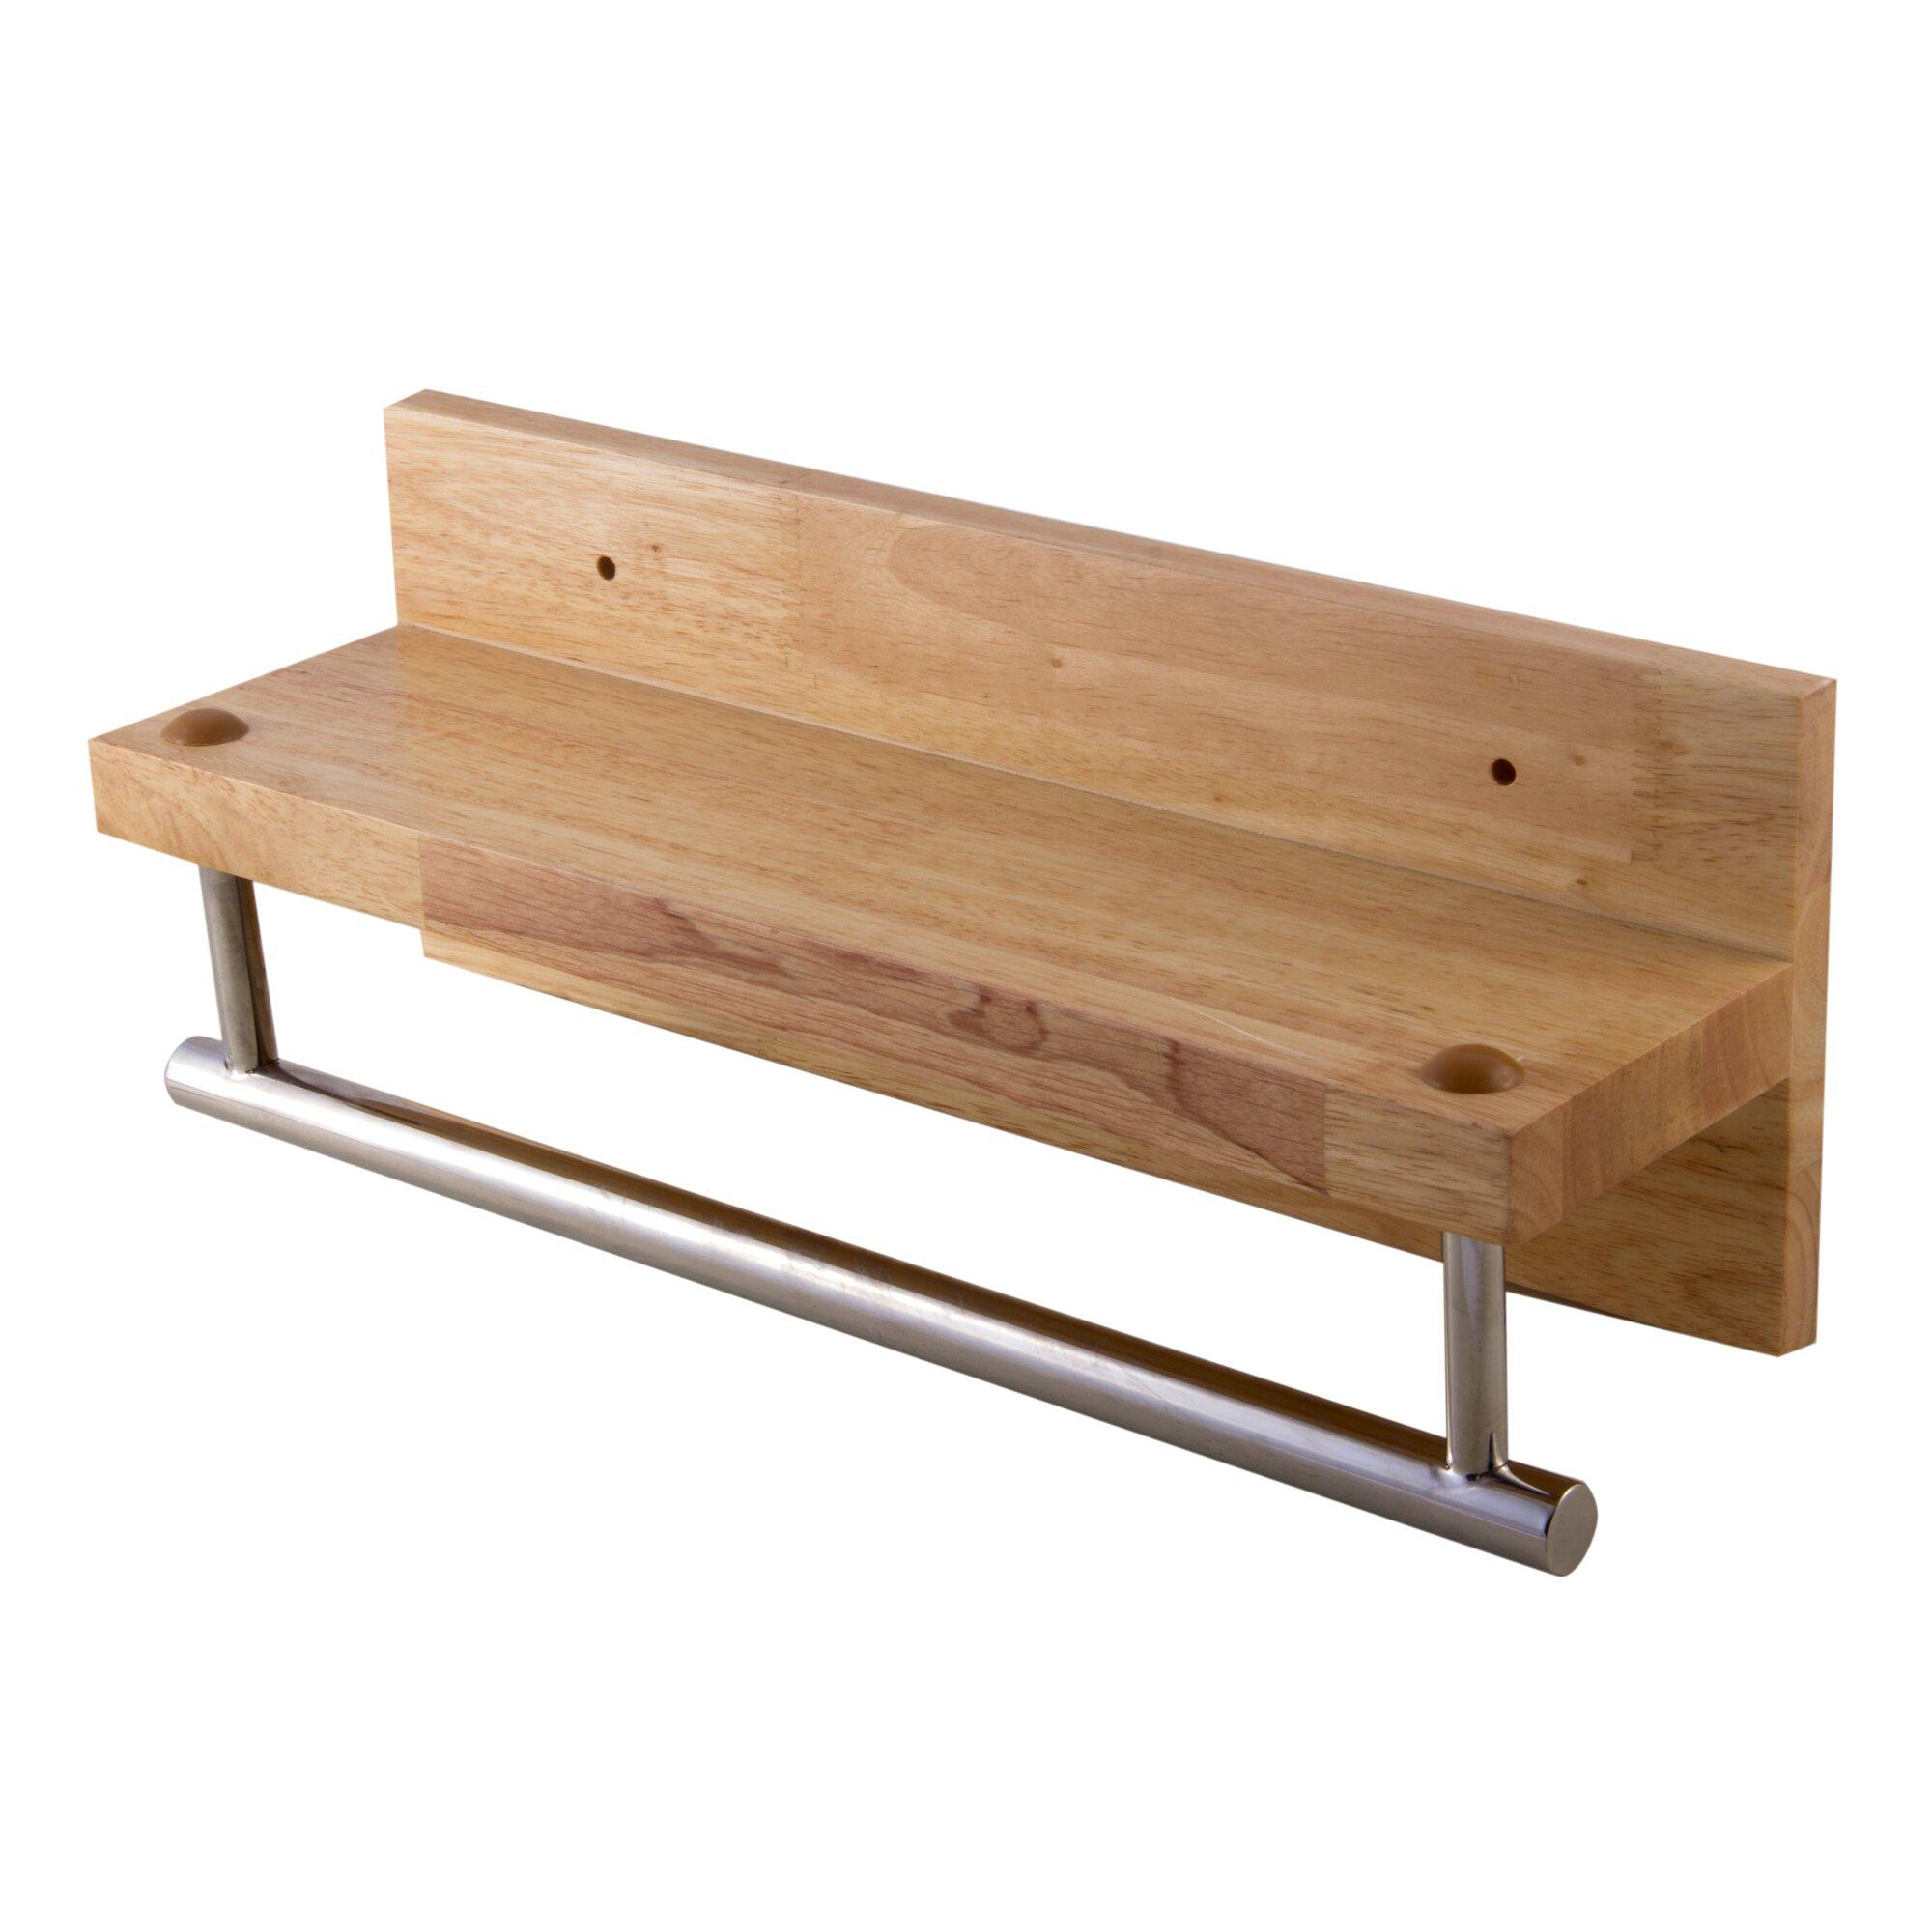 "Wooden Shelf With Towel Bar: Alfi Brand Wooden Shelf 16"" Wall Mounted Towel Bar"